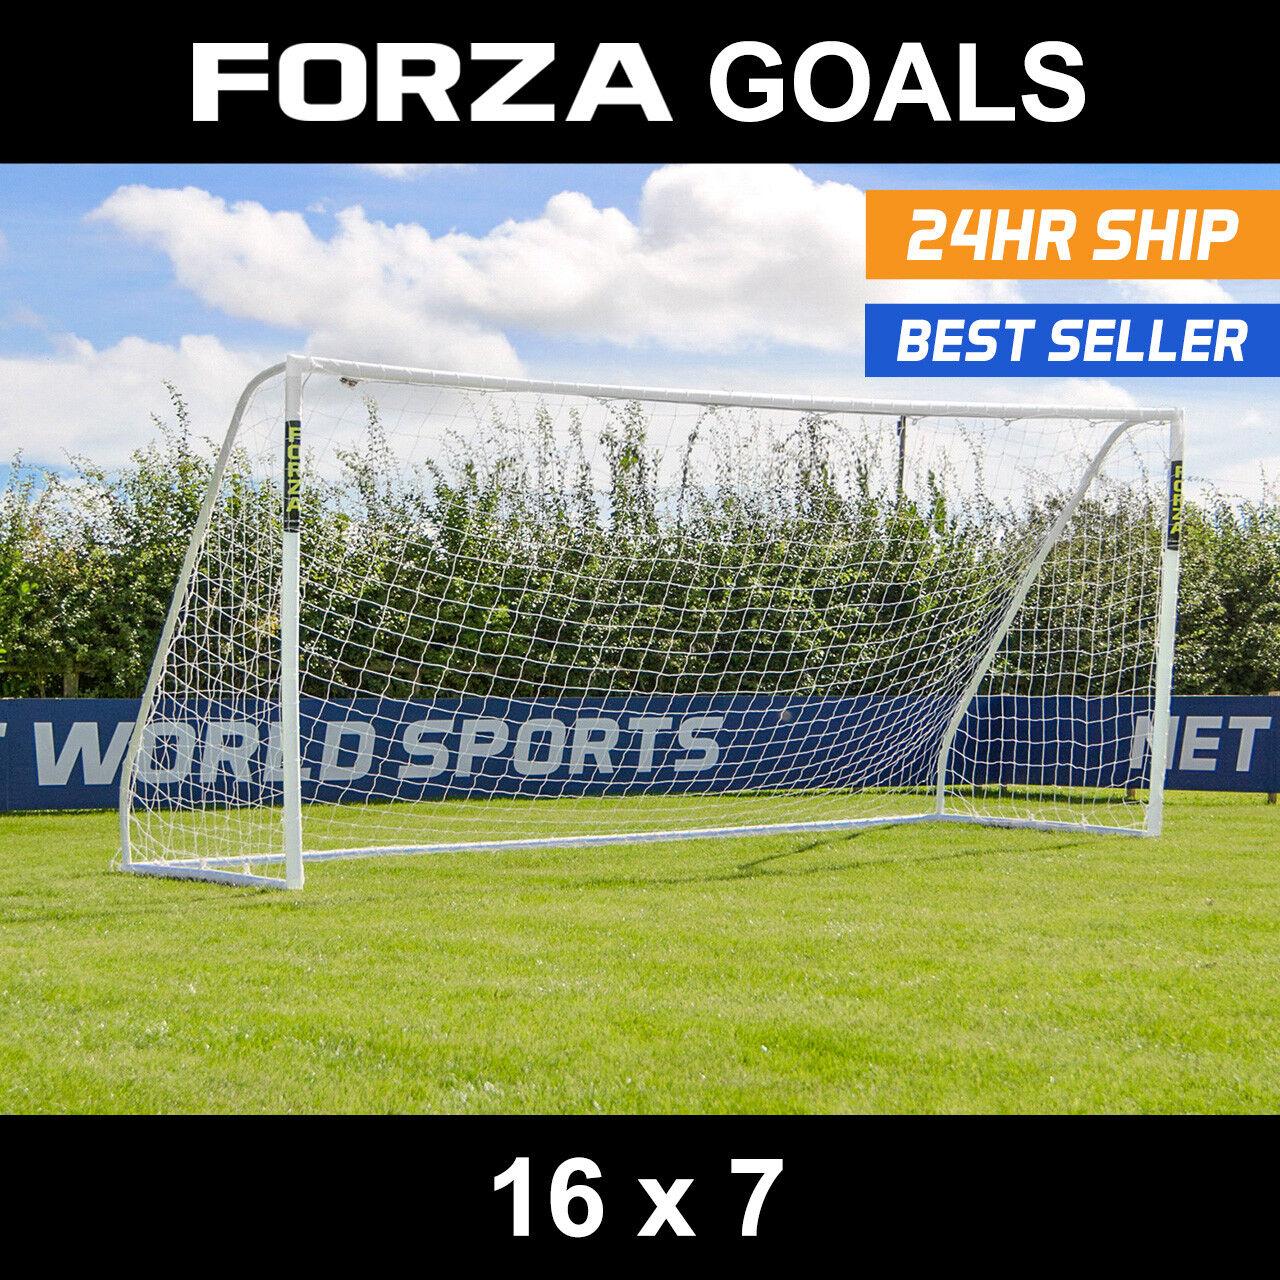 Forza MATCH Fútbol Meta   16 ft (approx. 4.88 m) X 7 ft (approx. 2.13 m)   9 V 9 meta   Meta   objetivos de PVC Senior